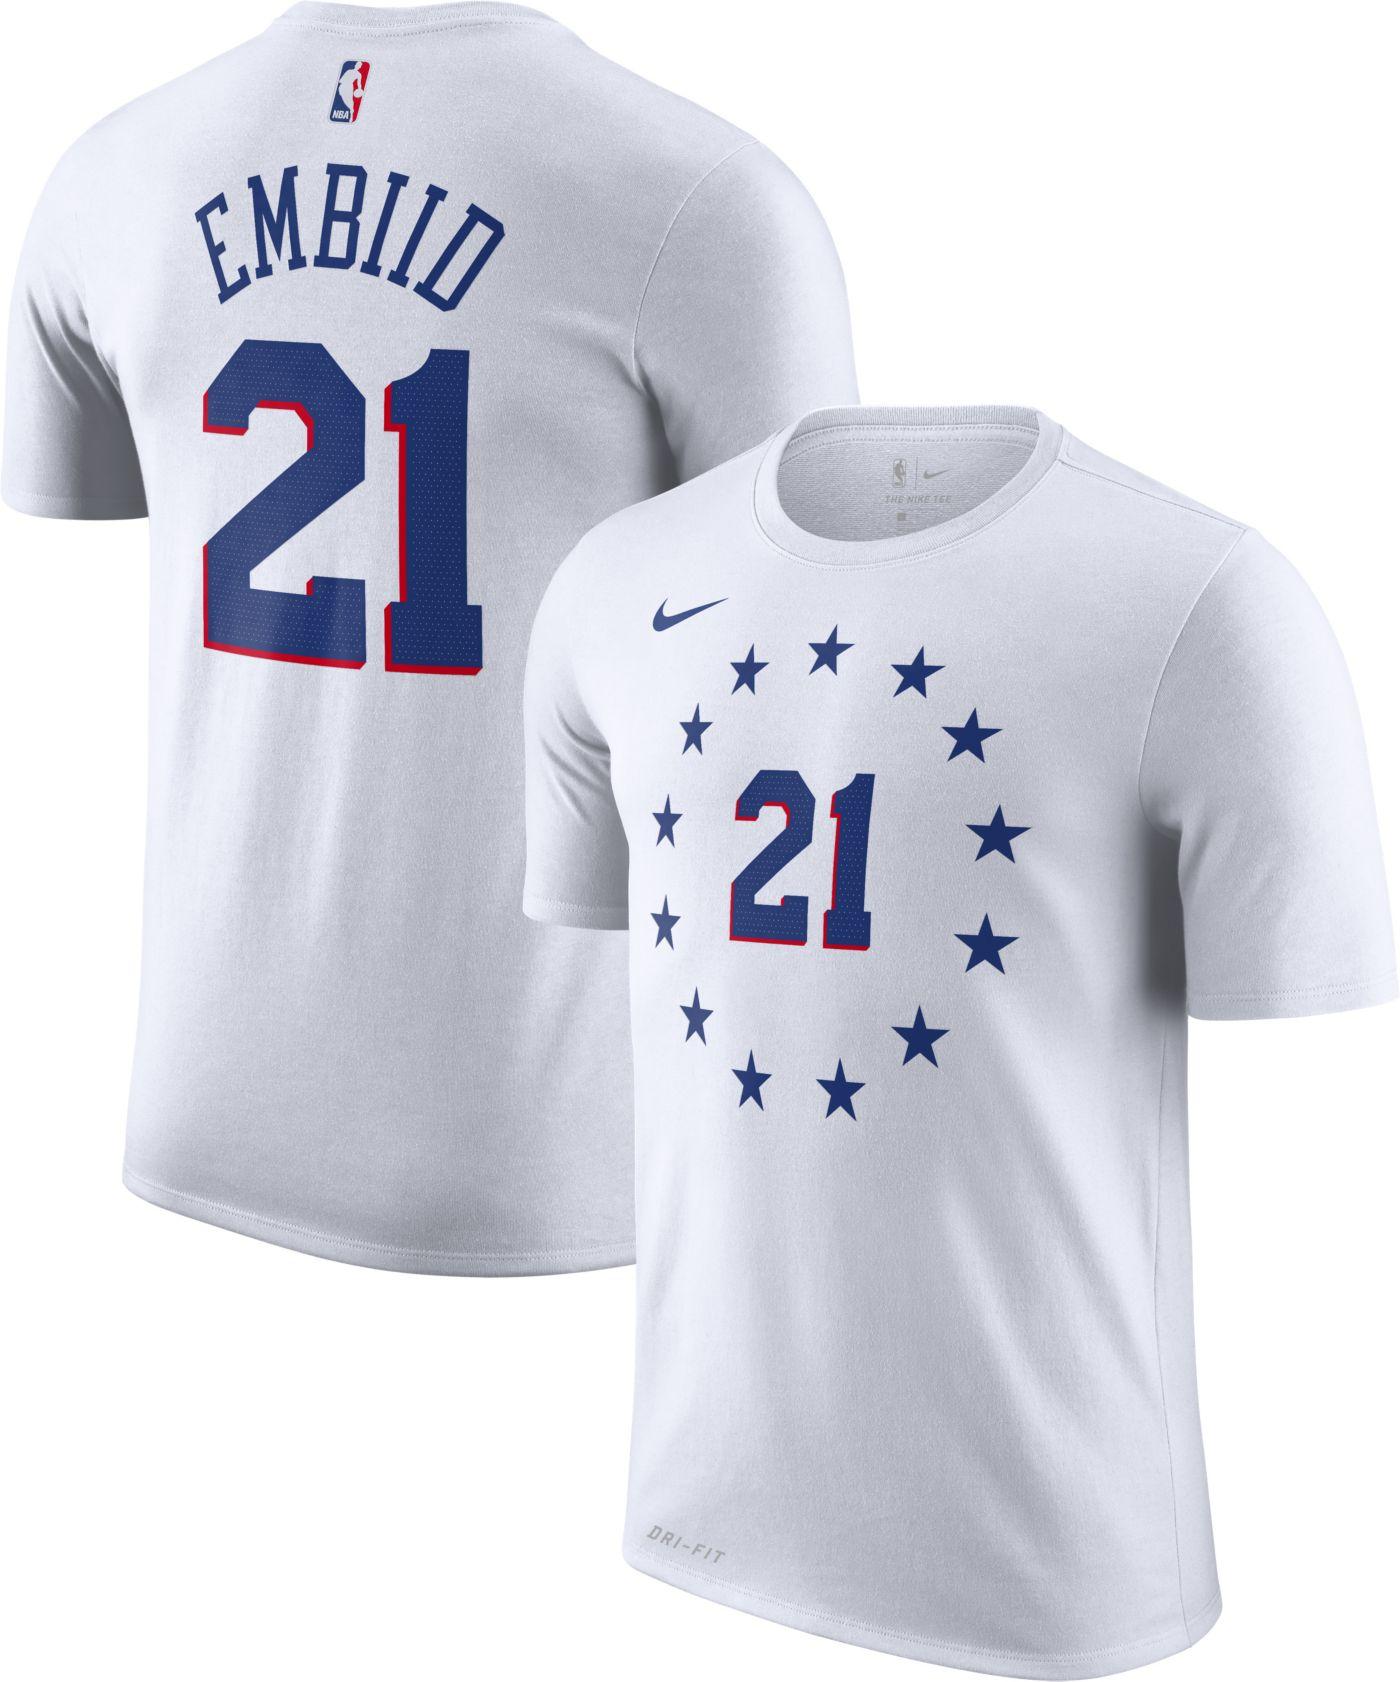 Nike Men's Philadelphia 76ers Joel Embiid Dri-FIT Earned Edition T-Shirt